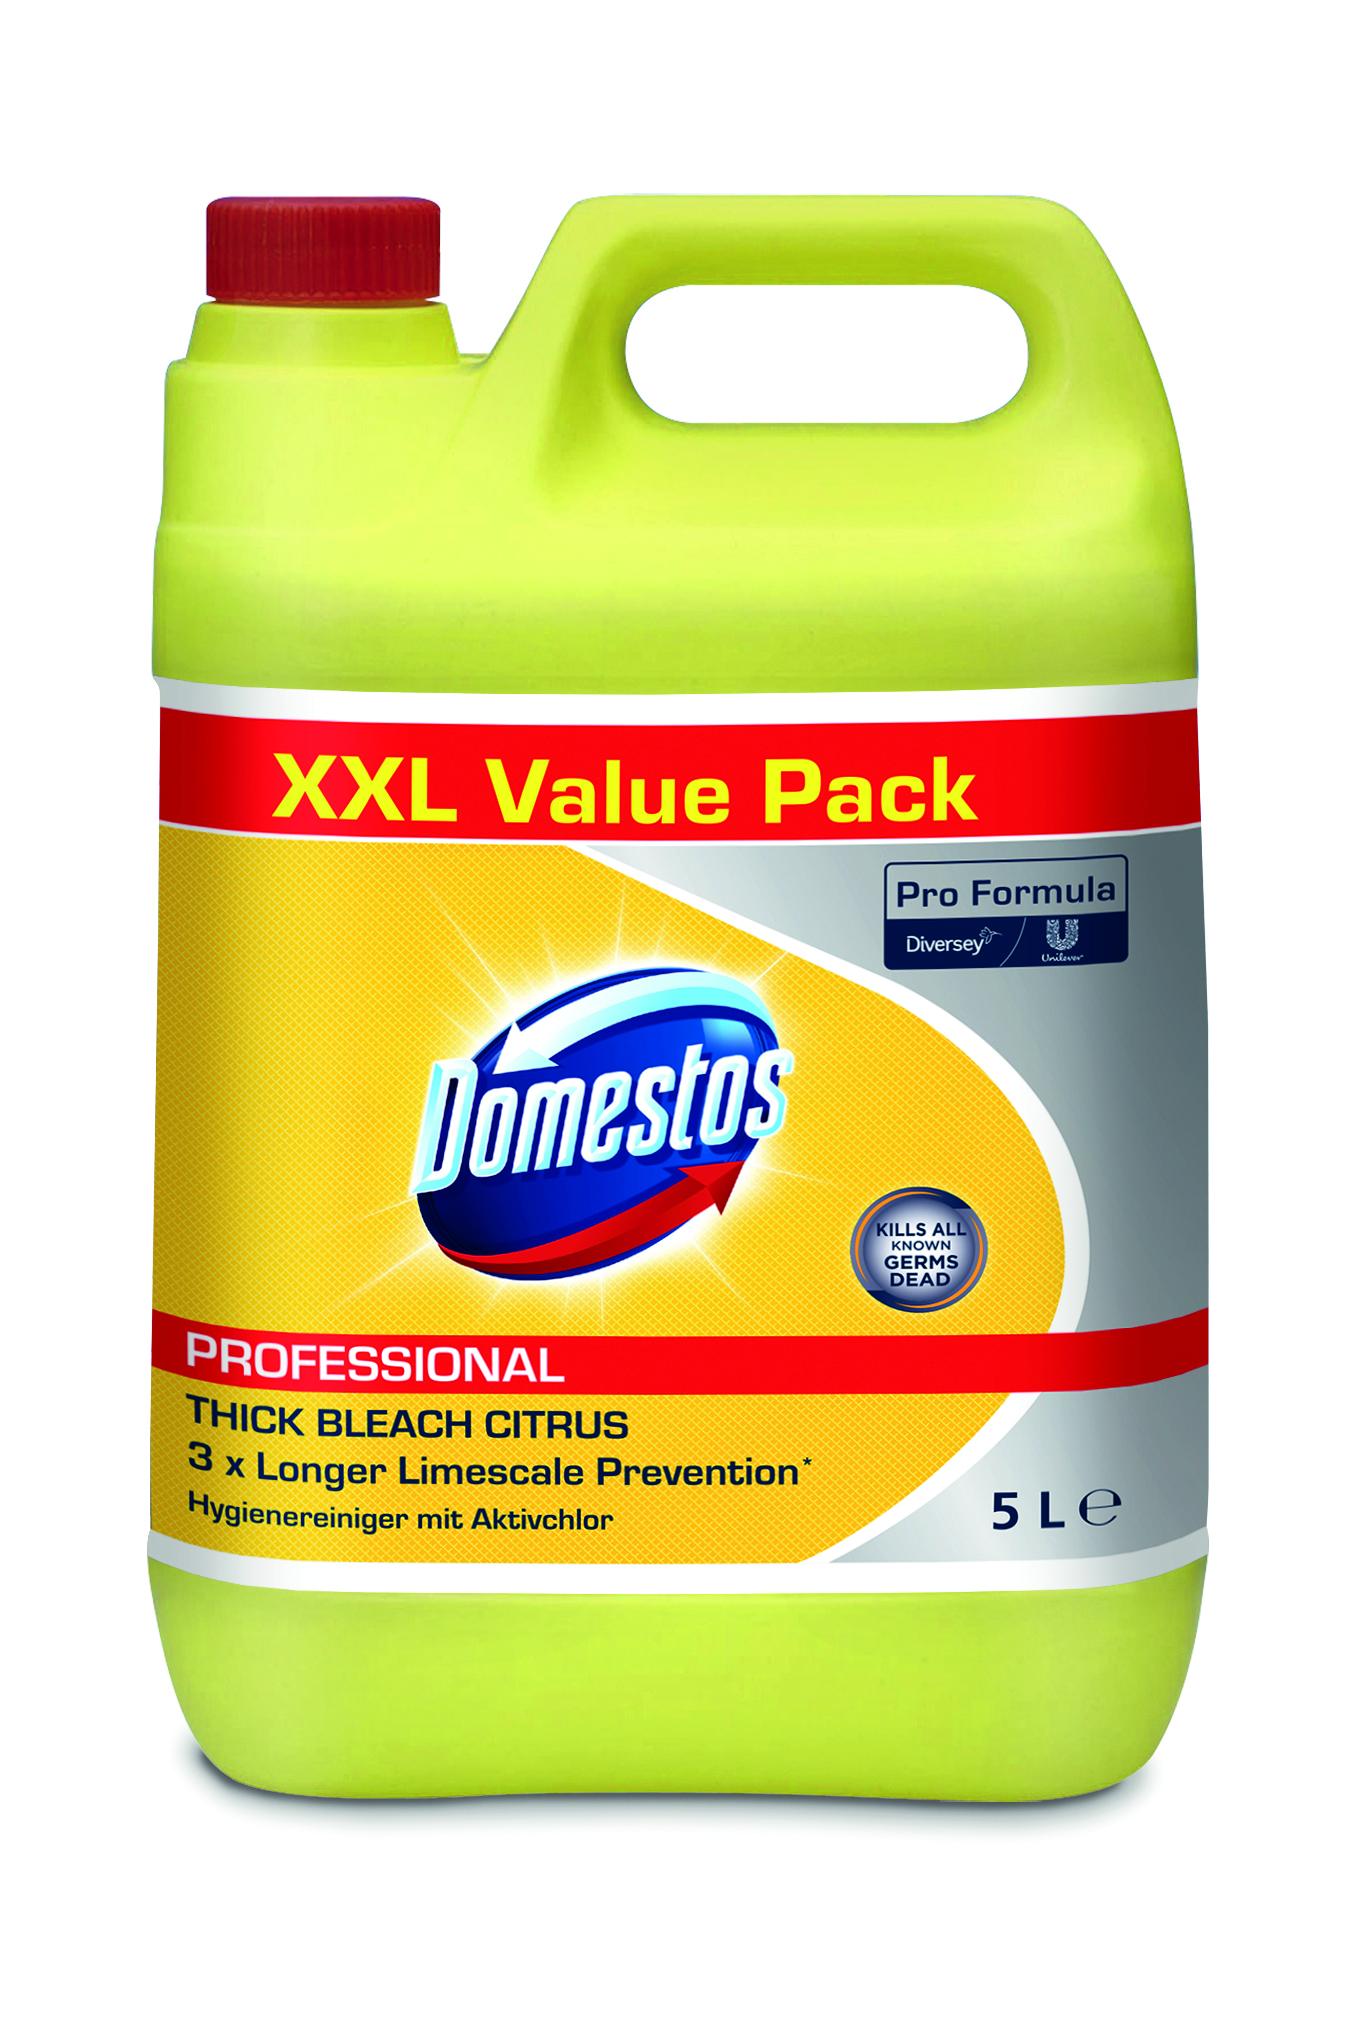 Domestos Professional Hygienereiniger Citrus mit Aktiv-Chlor 5L -